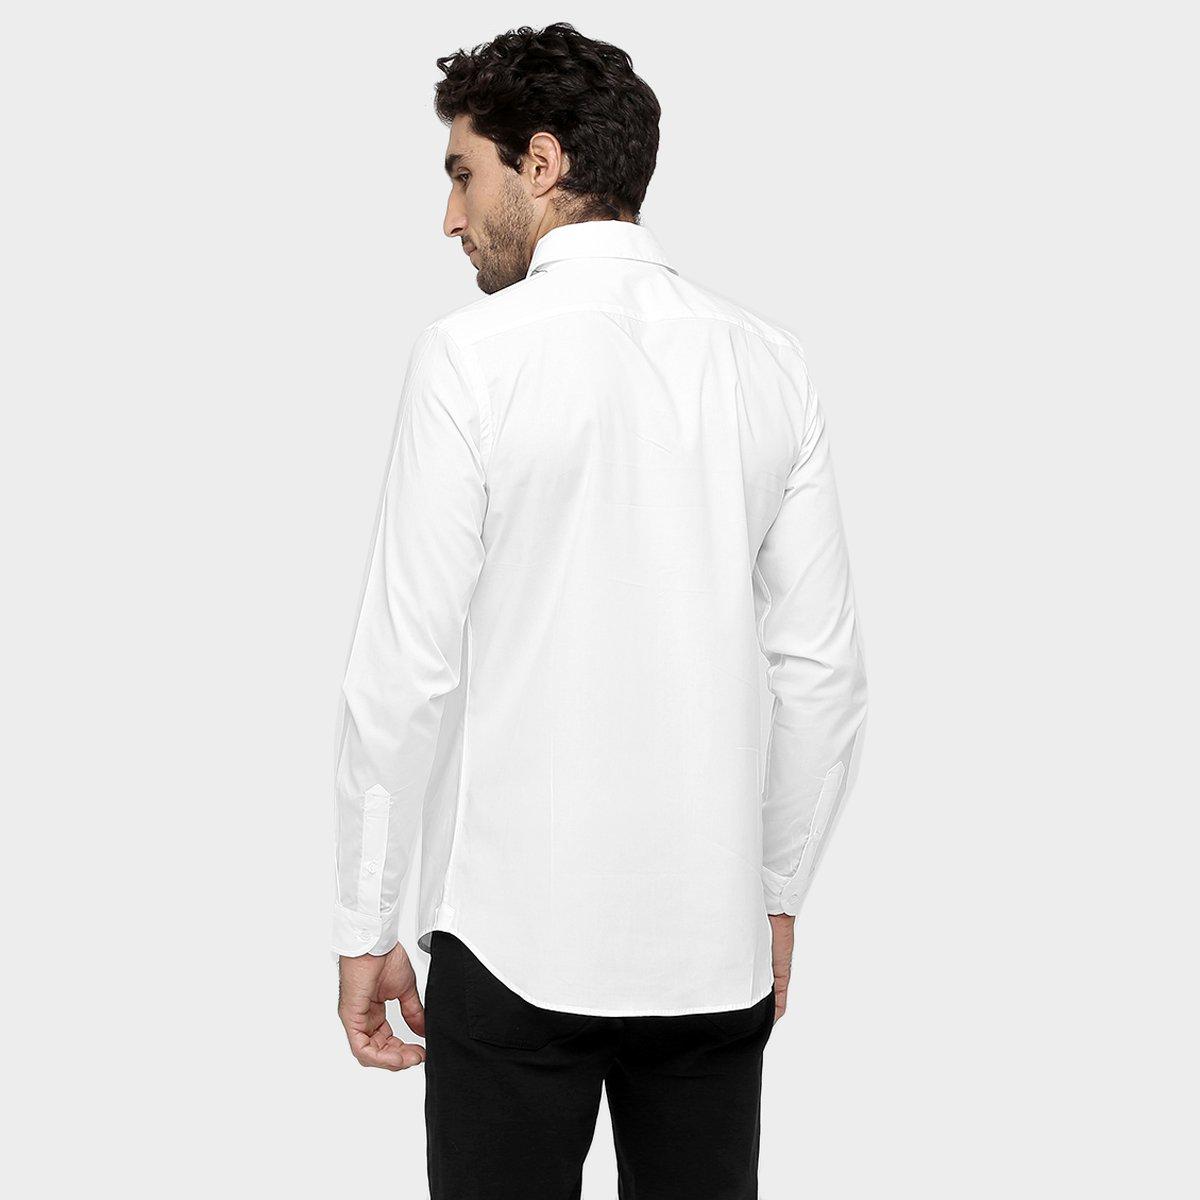 ac362c0f4b06e Camisa Lacoste Slim Fit Lisa - Compre Agora   Netshoes